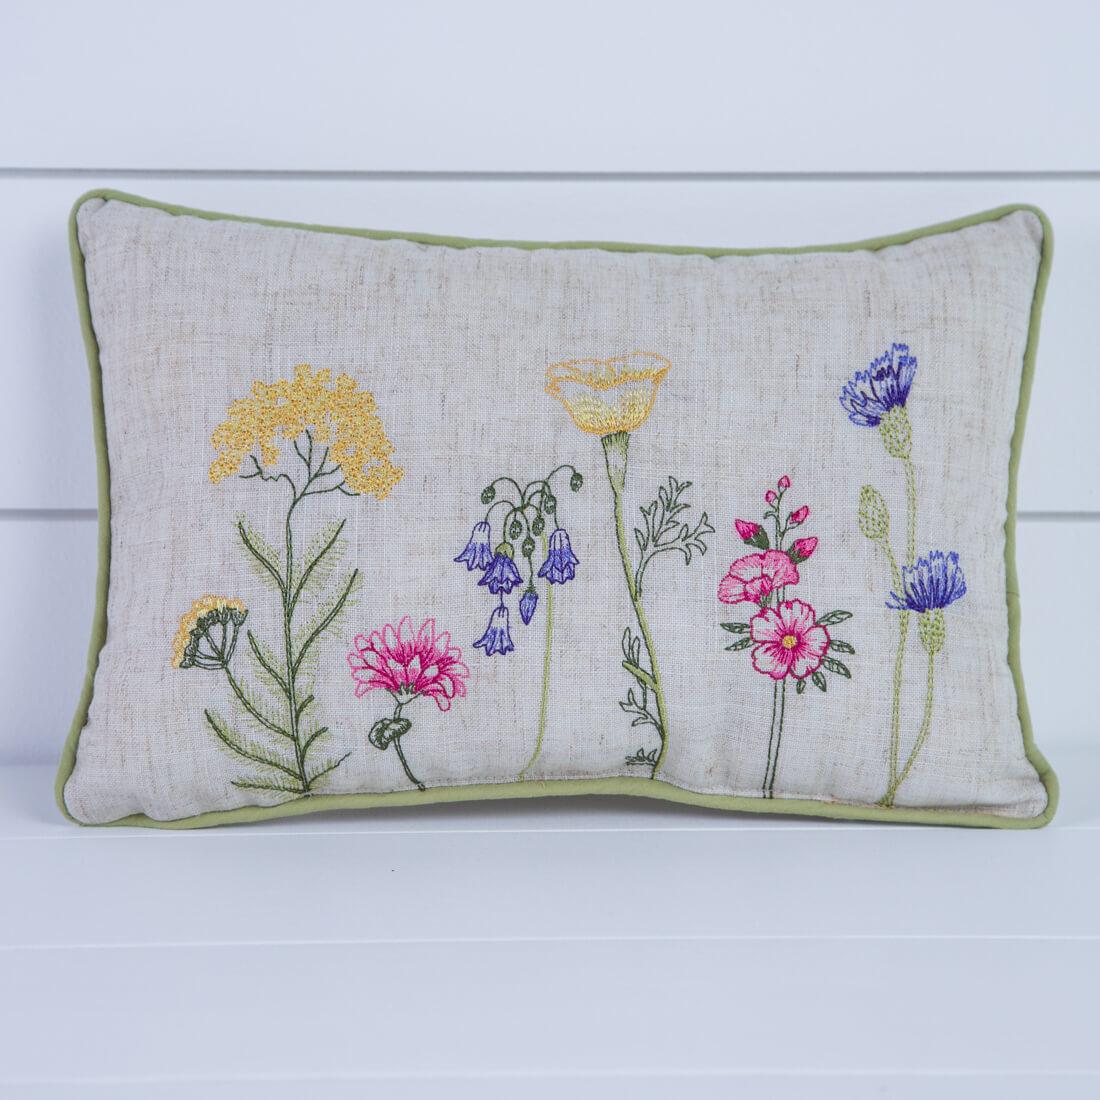 Floral Garden Pillow